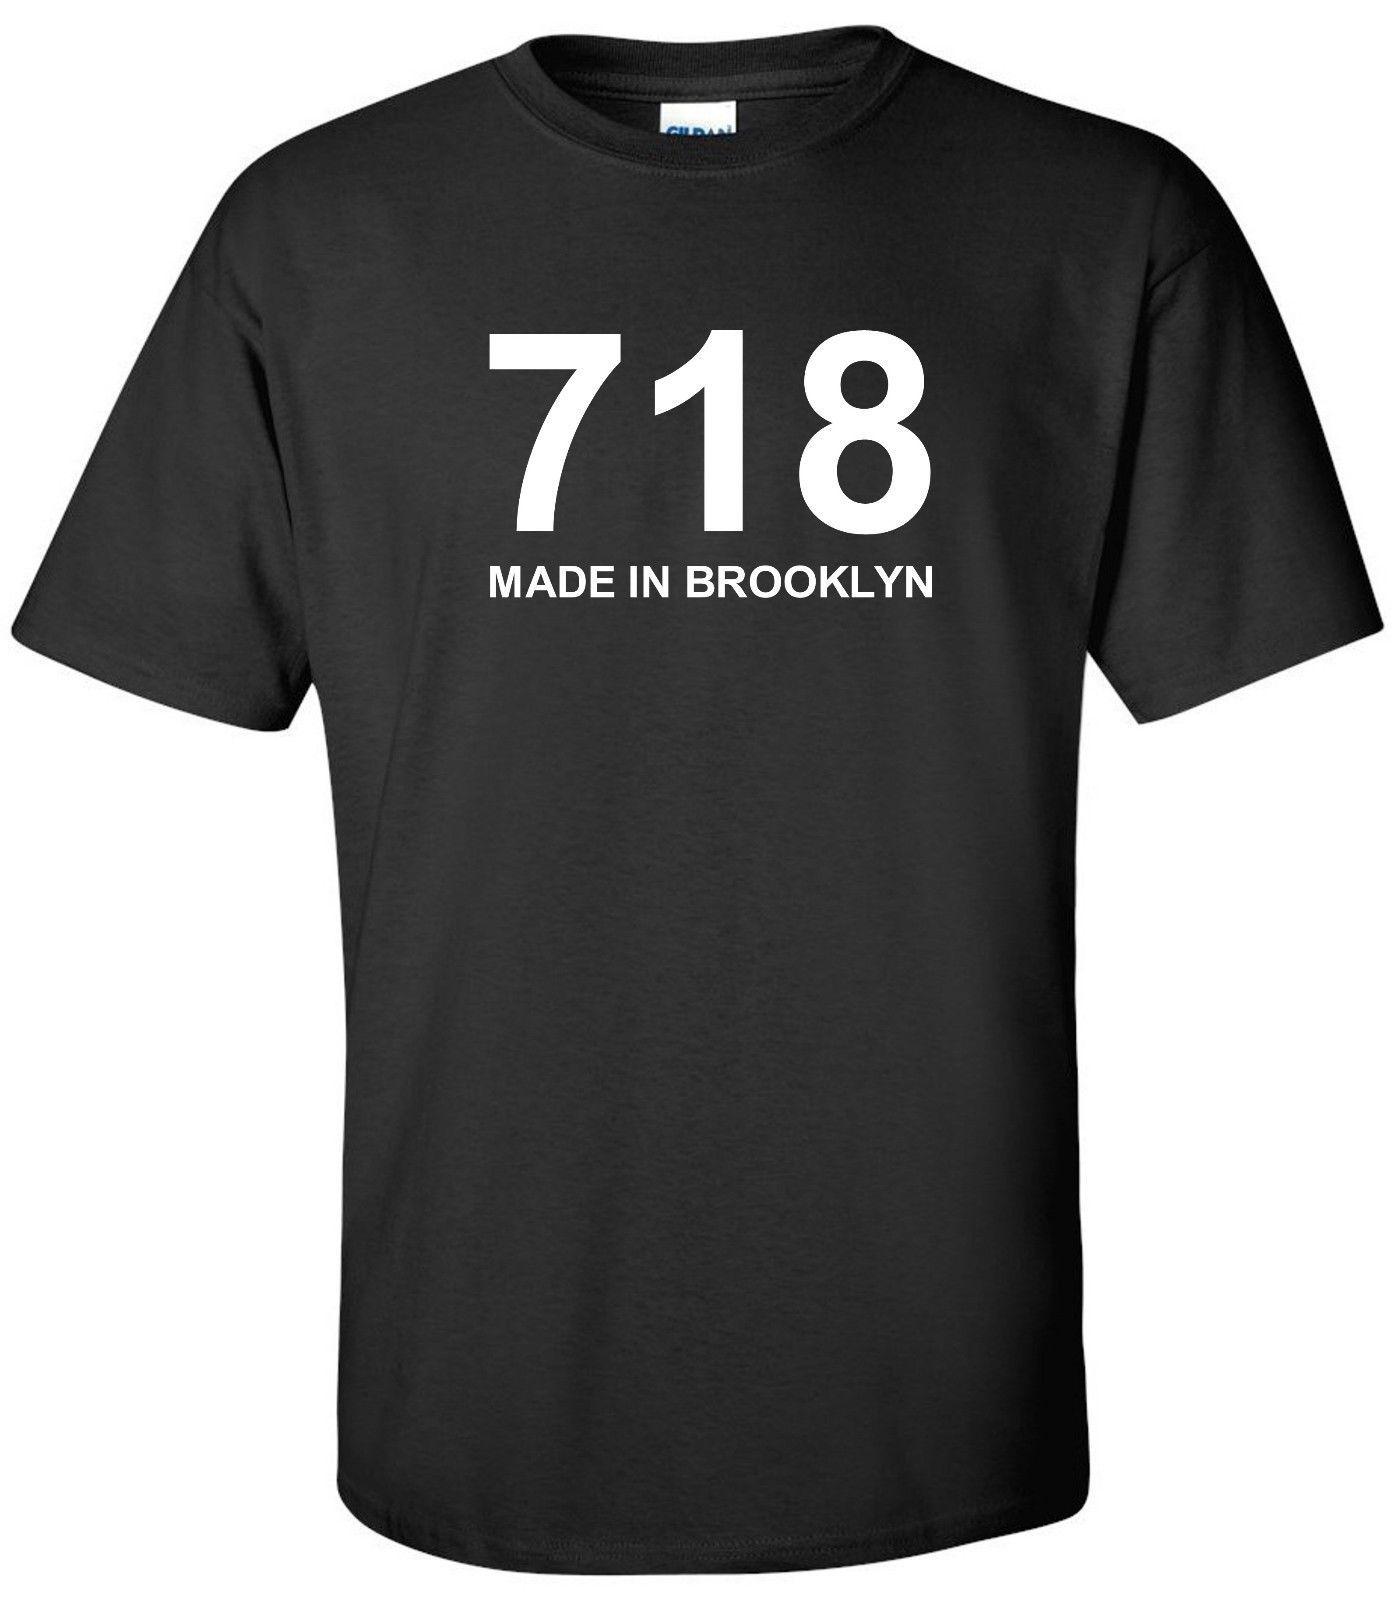 4ba74cad0 MADE IN BROOKLYN 718 T SHIRT AREA CODE NY NEW YORK CITY BLACK TEE SHIRT  Funny Unisex Casual Tee Gift T Shirt Logos Trendy T Shirts From  Noveltgifts, ...